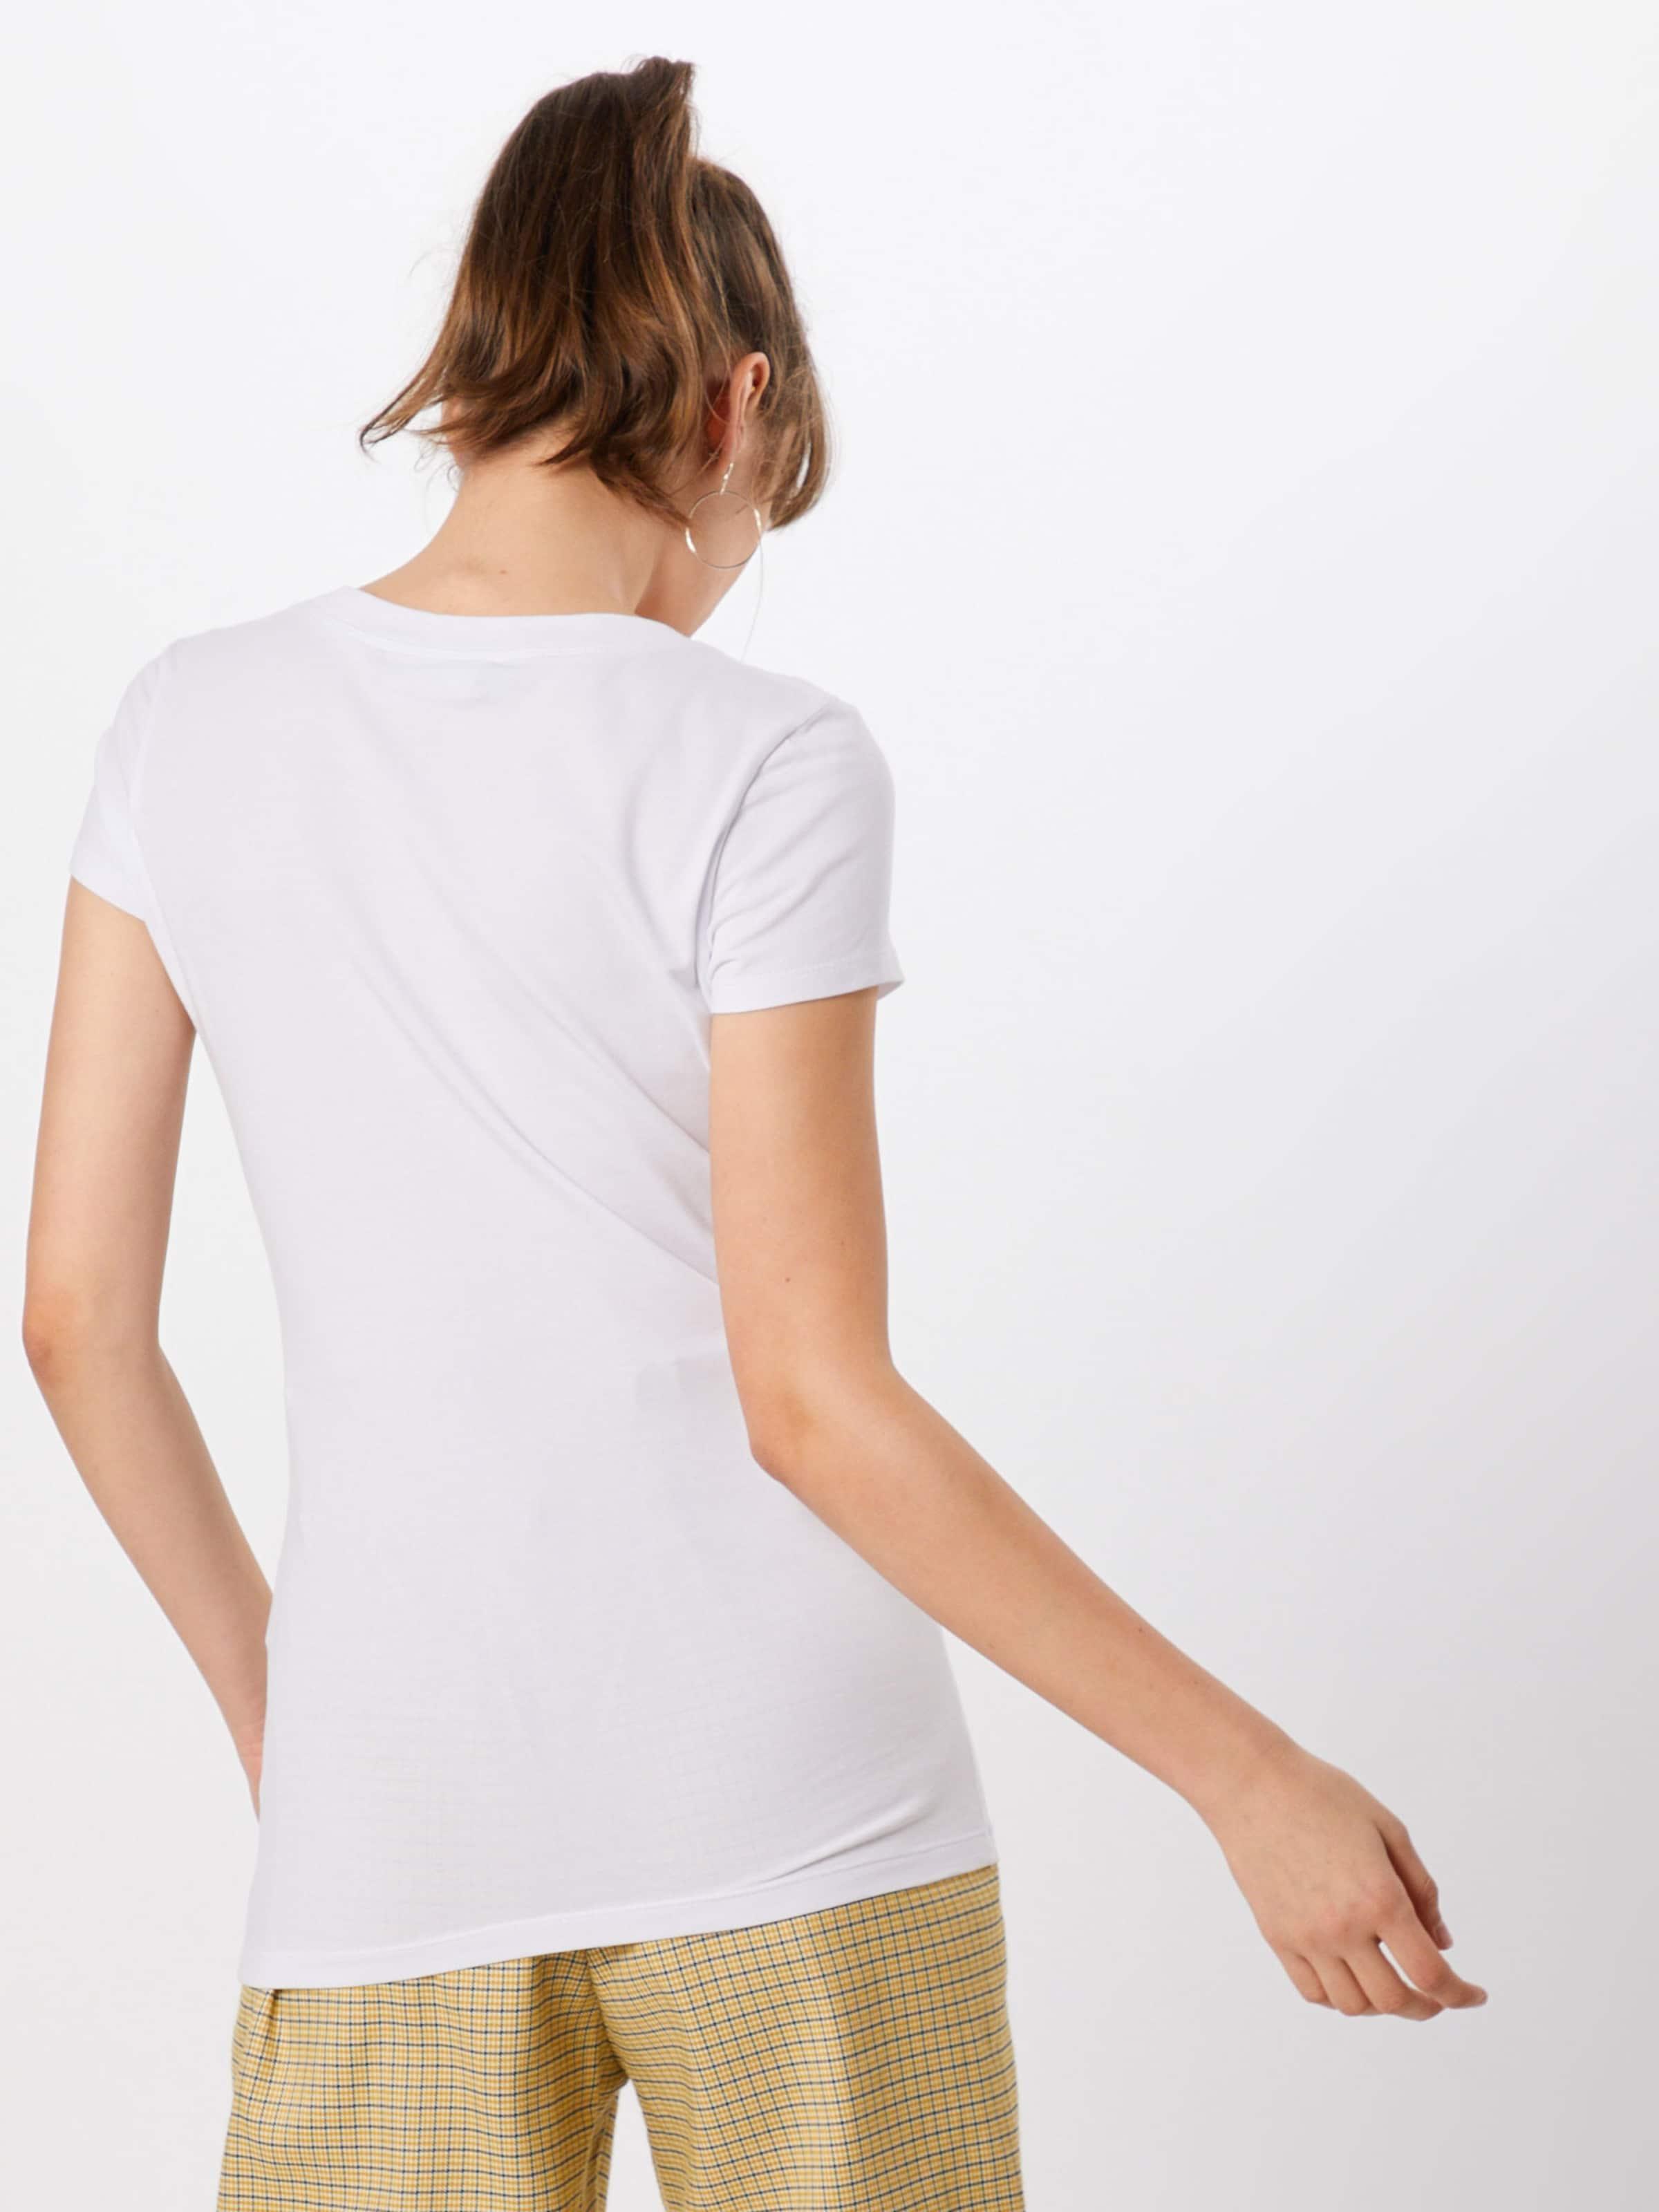 Force' St shirt En c Hair T M 'maglietta Love Blanc Moschino wPOnk0